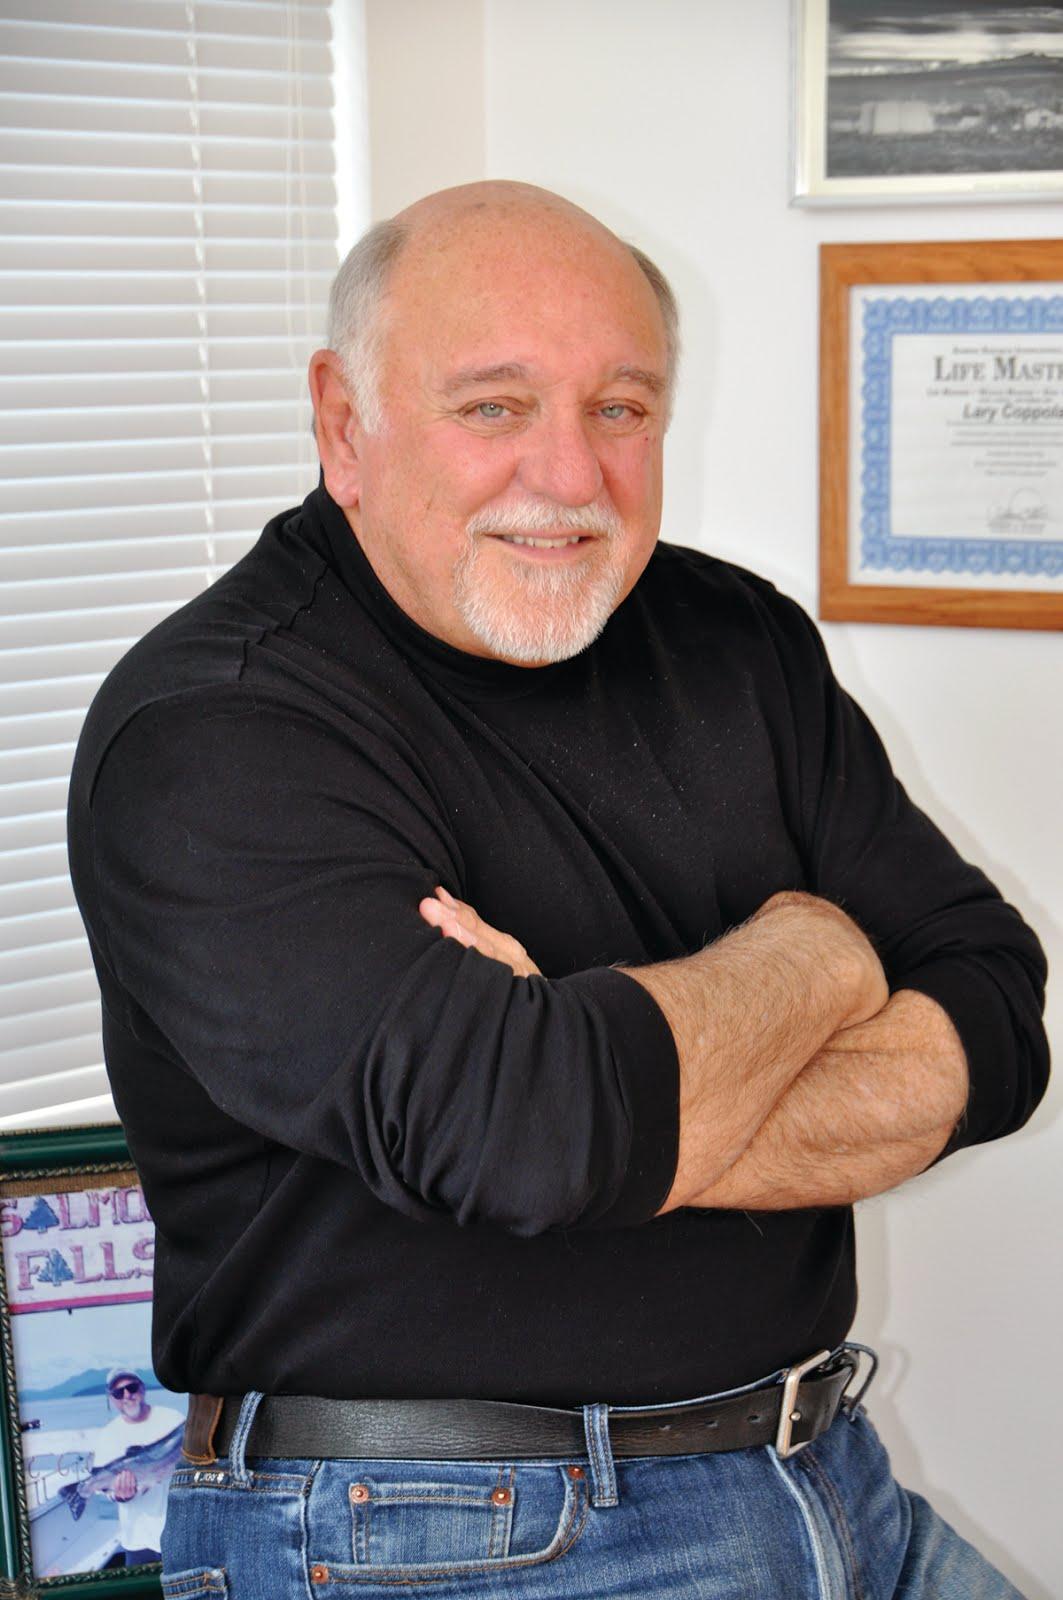 Lary Coppola